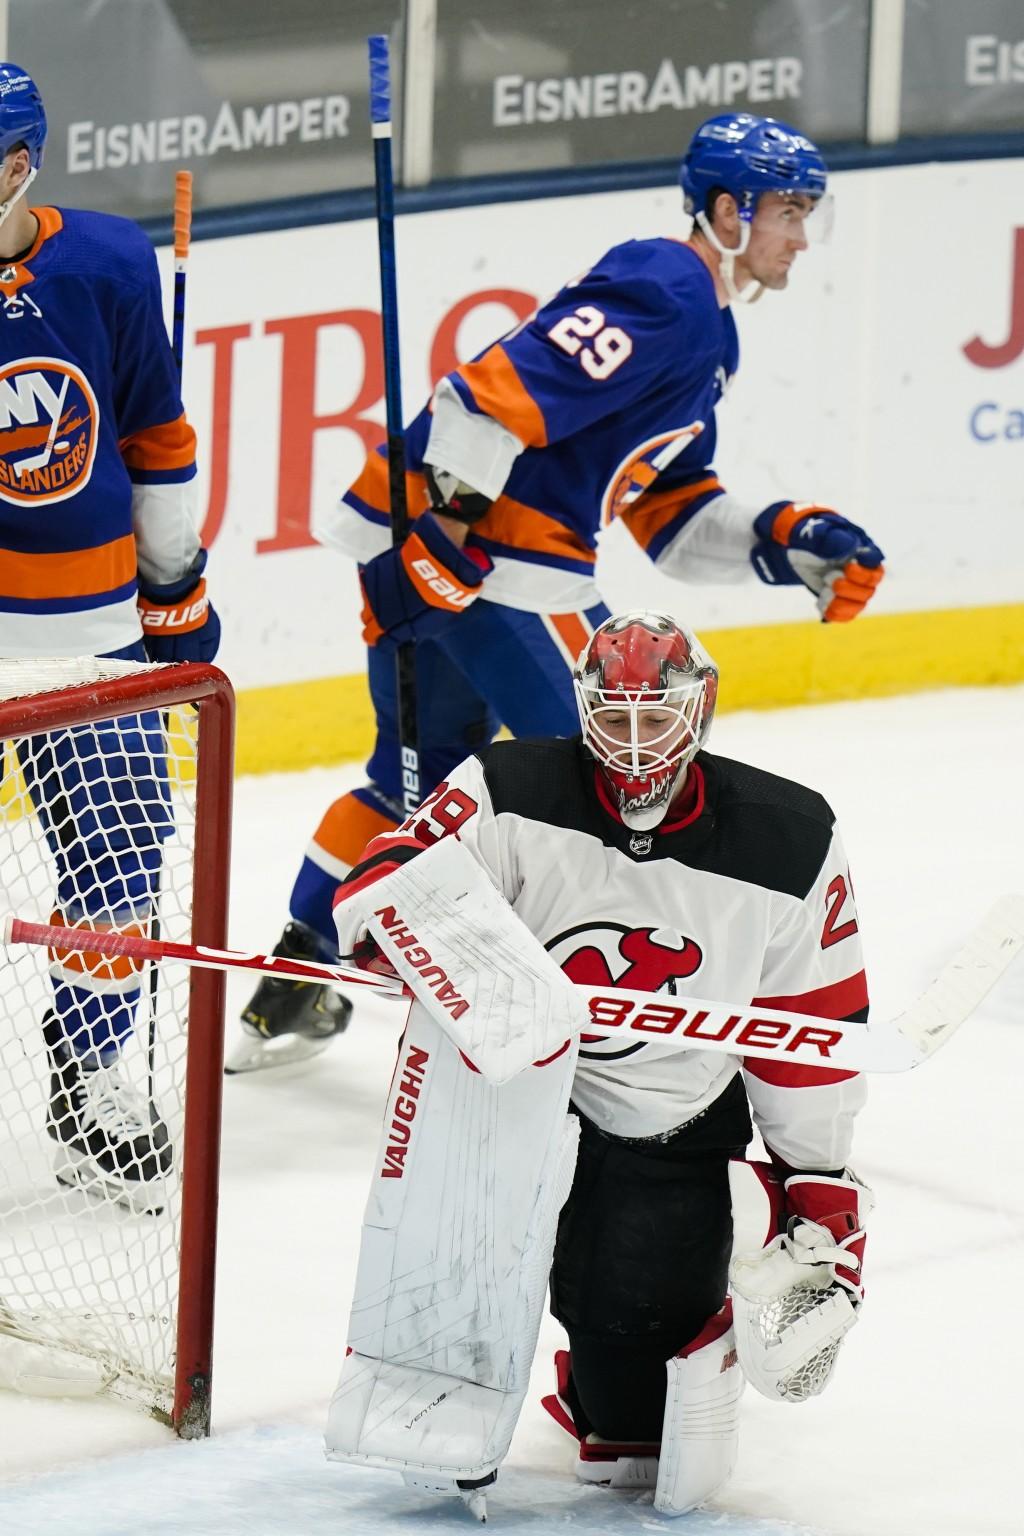 New Jersey Devils goaltender Mackenzie Blackwood (29) reacts as New York Islanders' Brock Nelson (29) skates toward his bench after scoring a goal dur...